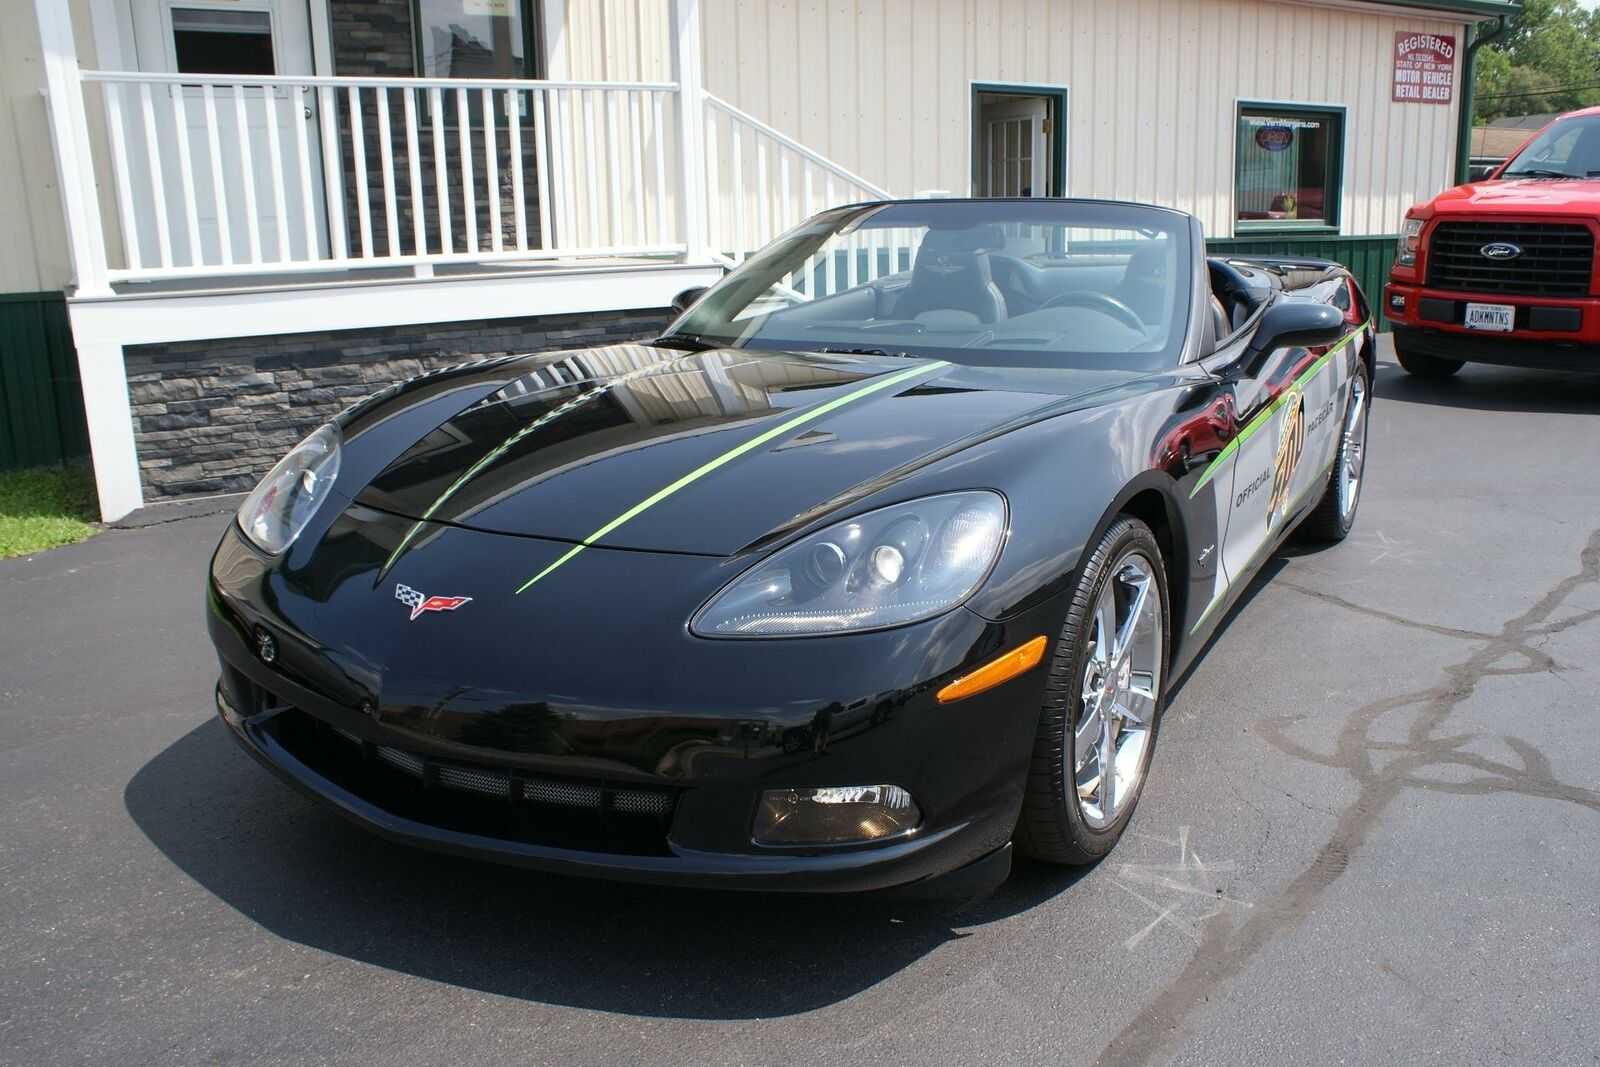 2008 Black Chevrolet Corvette   | C6 Corvette Photo 3